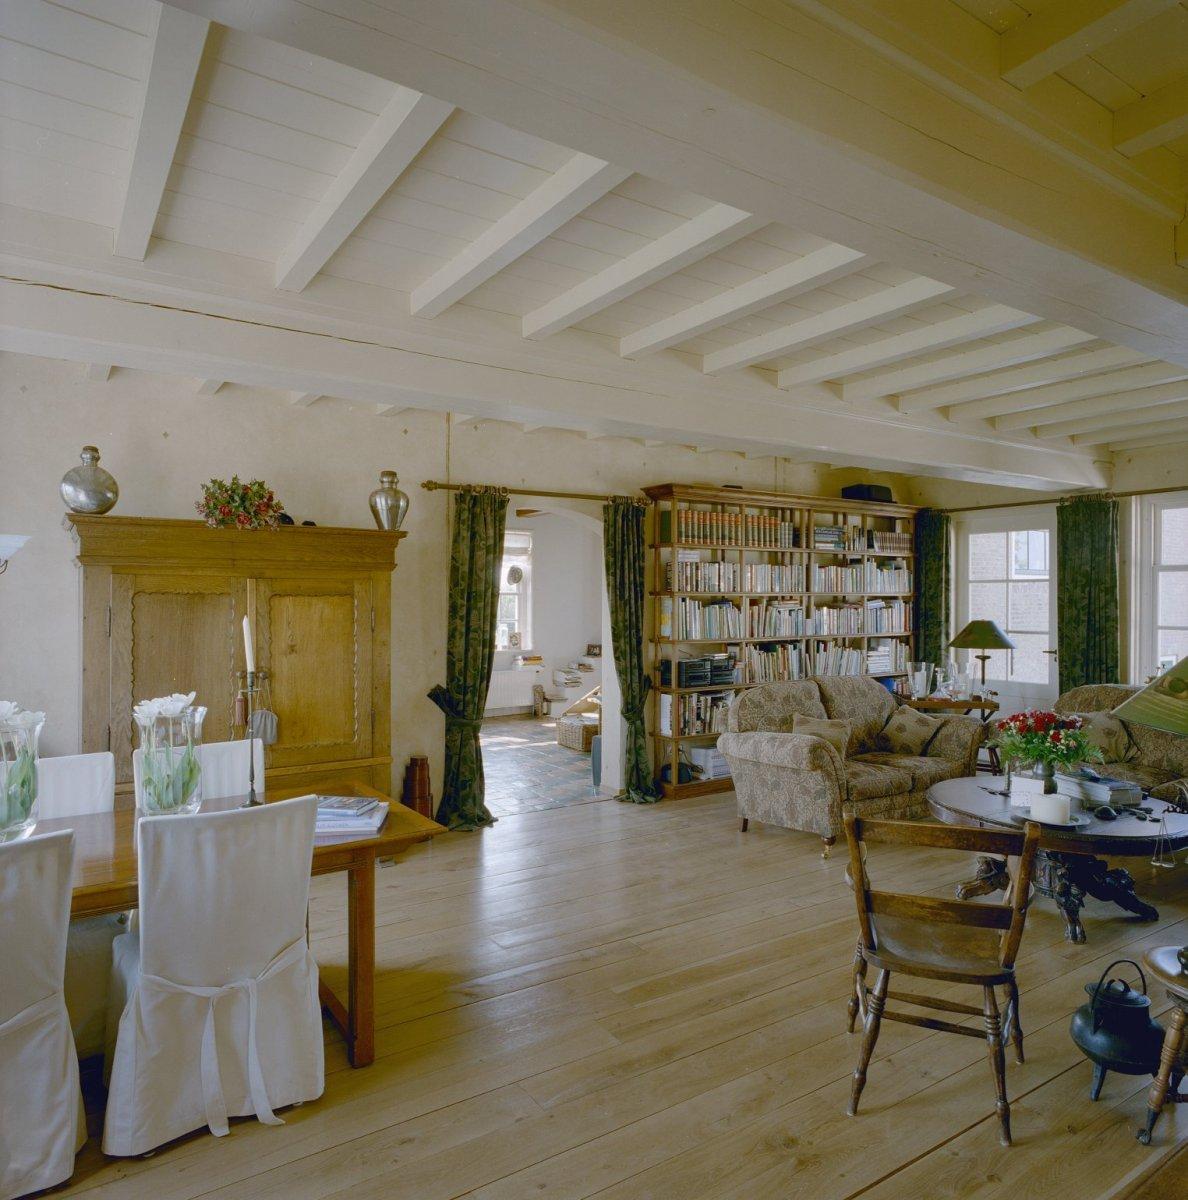 File:Interieur woonkamer met houten plafond, voorheen stalgedeelte, na ...